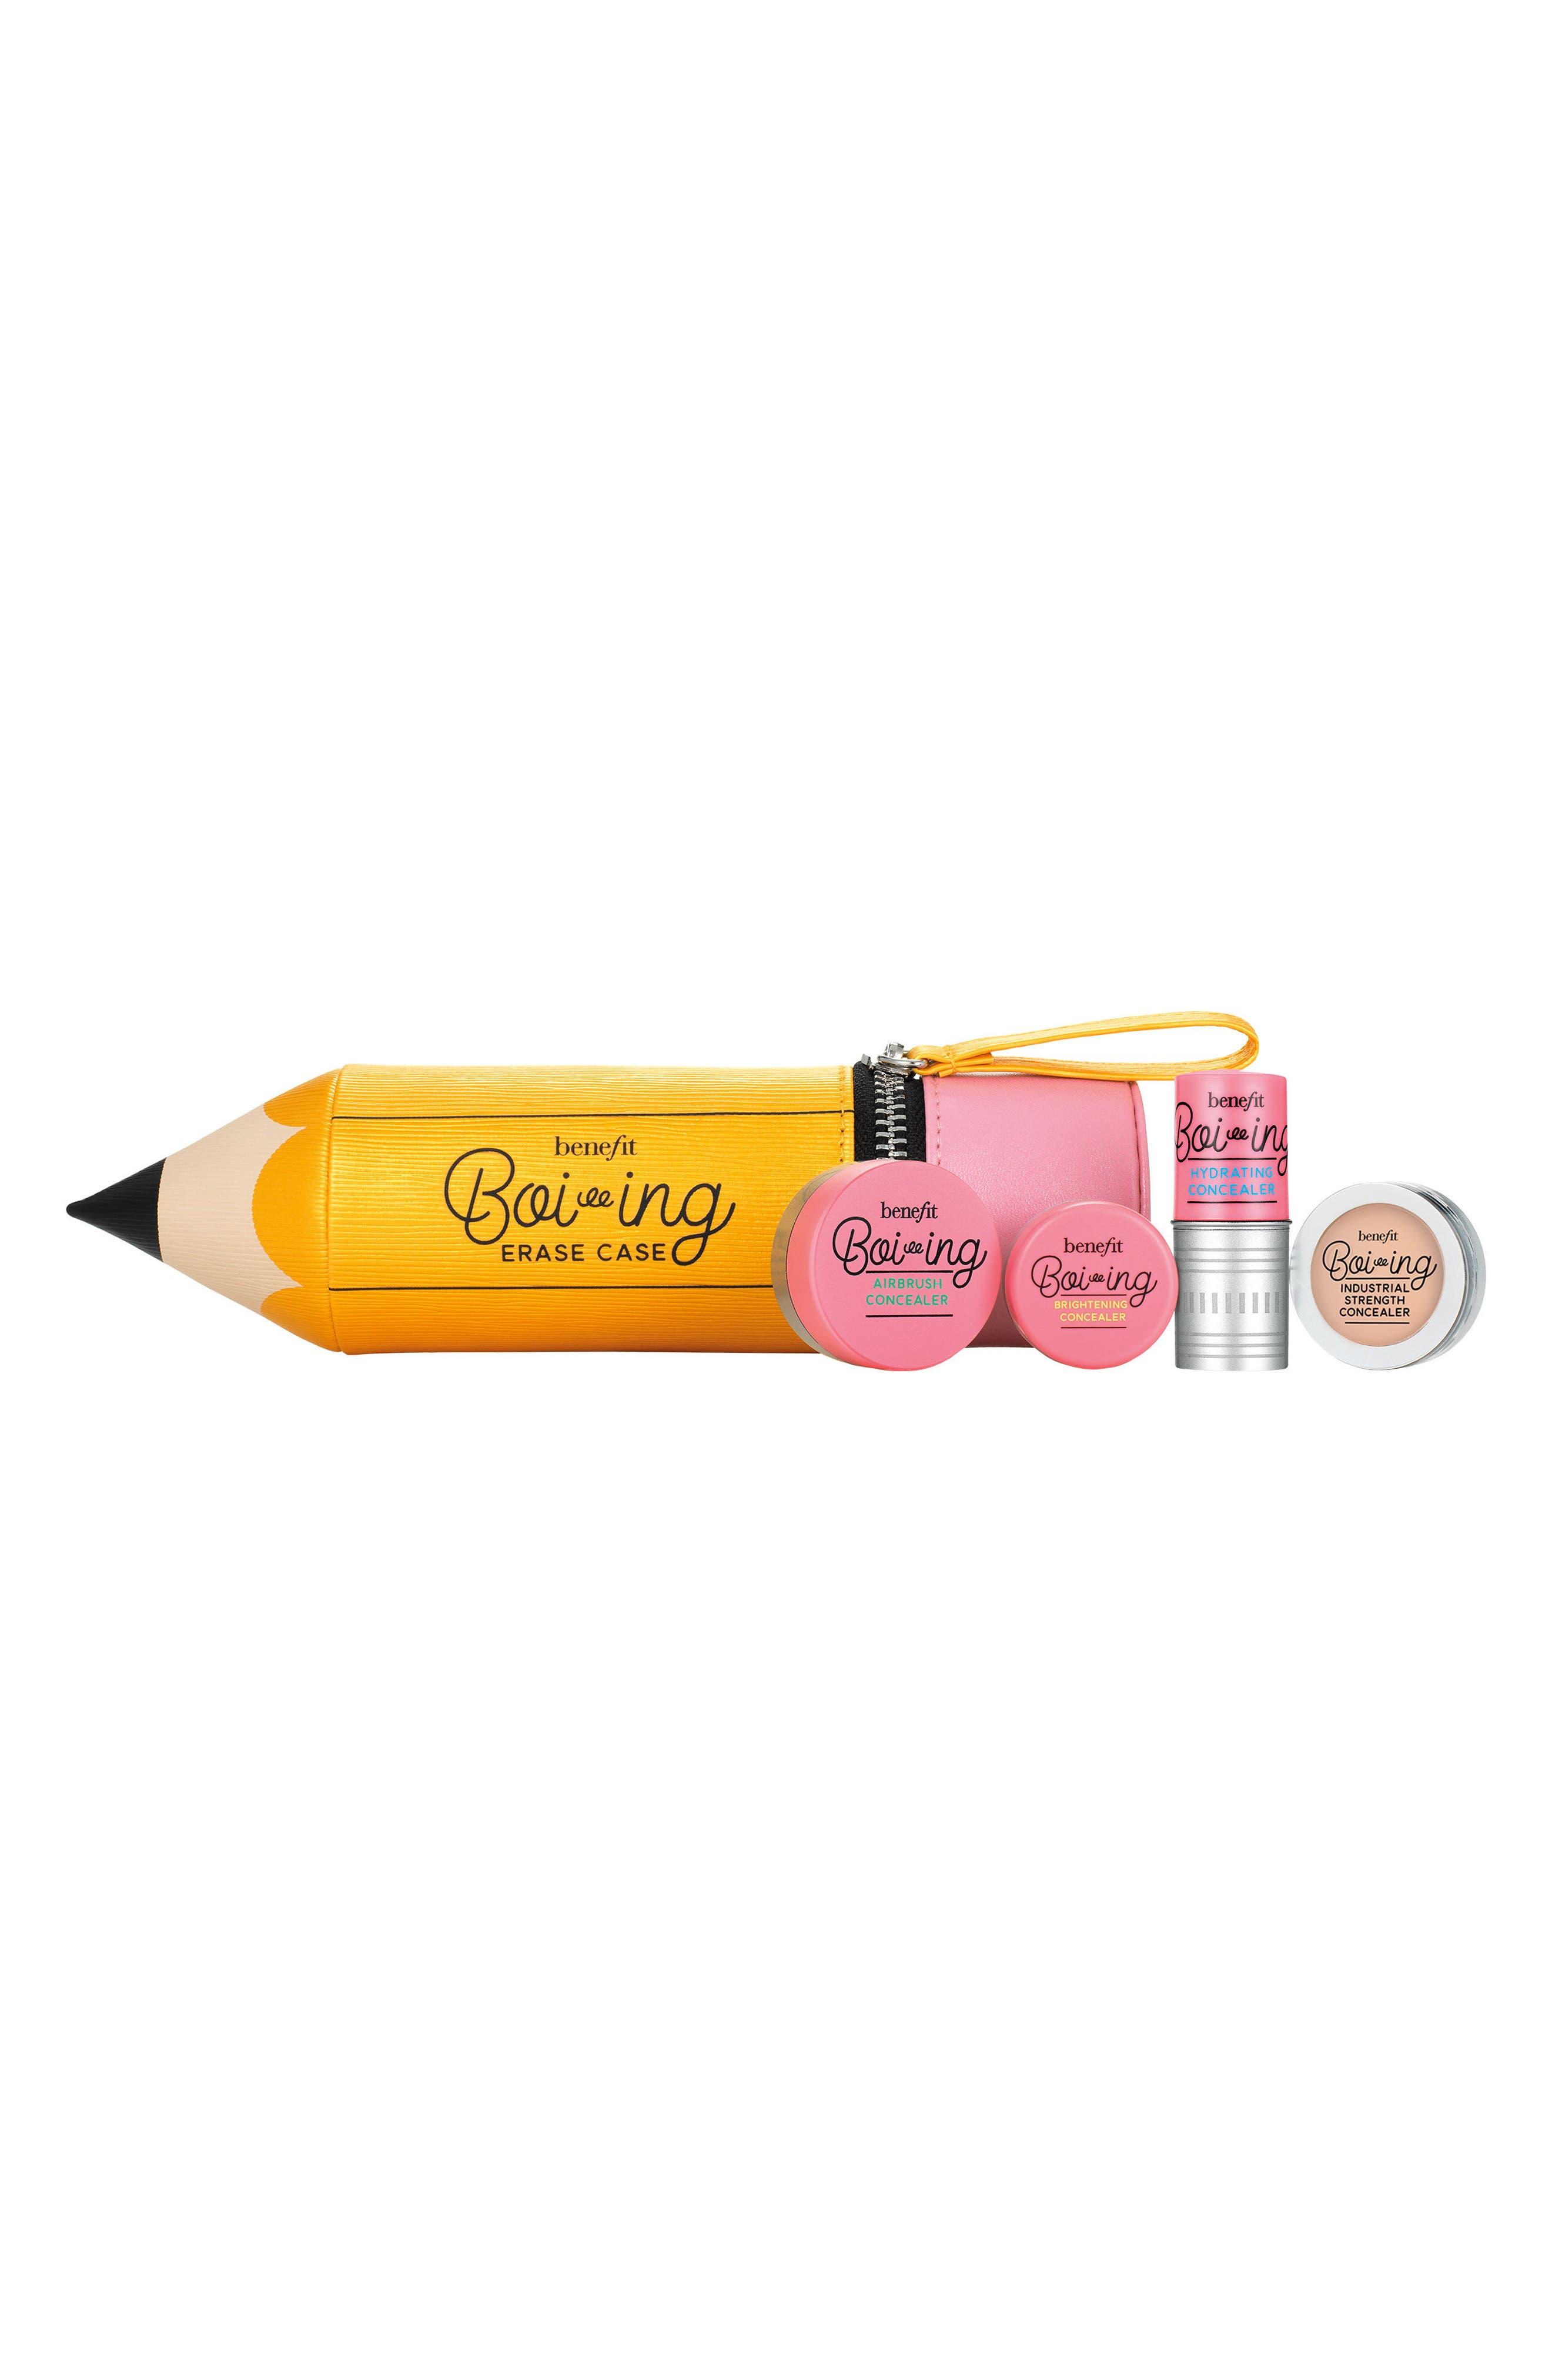 BENEFIT COSMETICS Benefit Erase Case Boi-ing Concealer Kit, Main, color, LIGHT